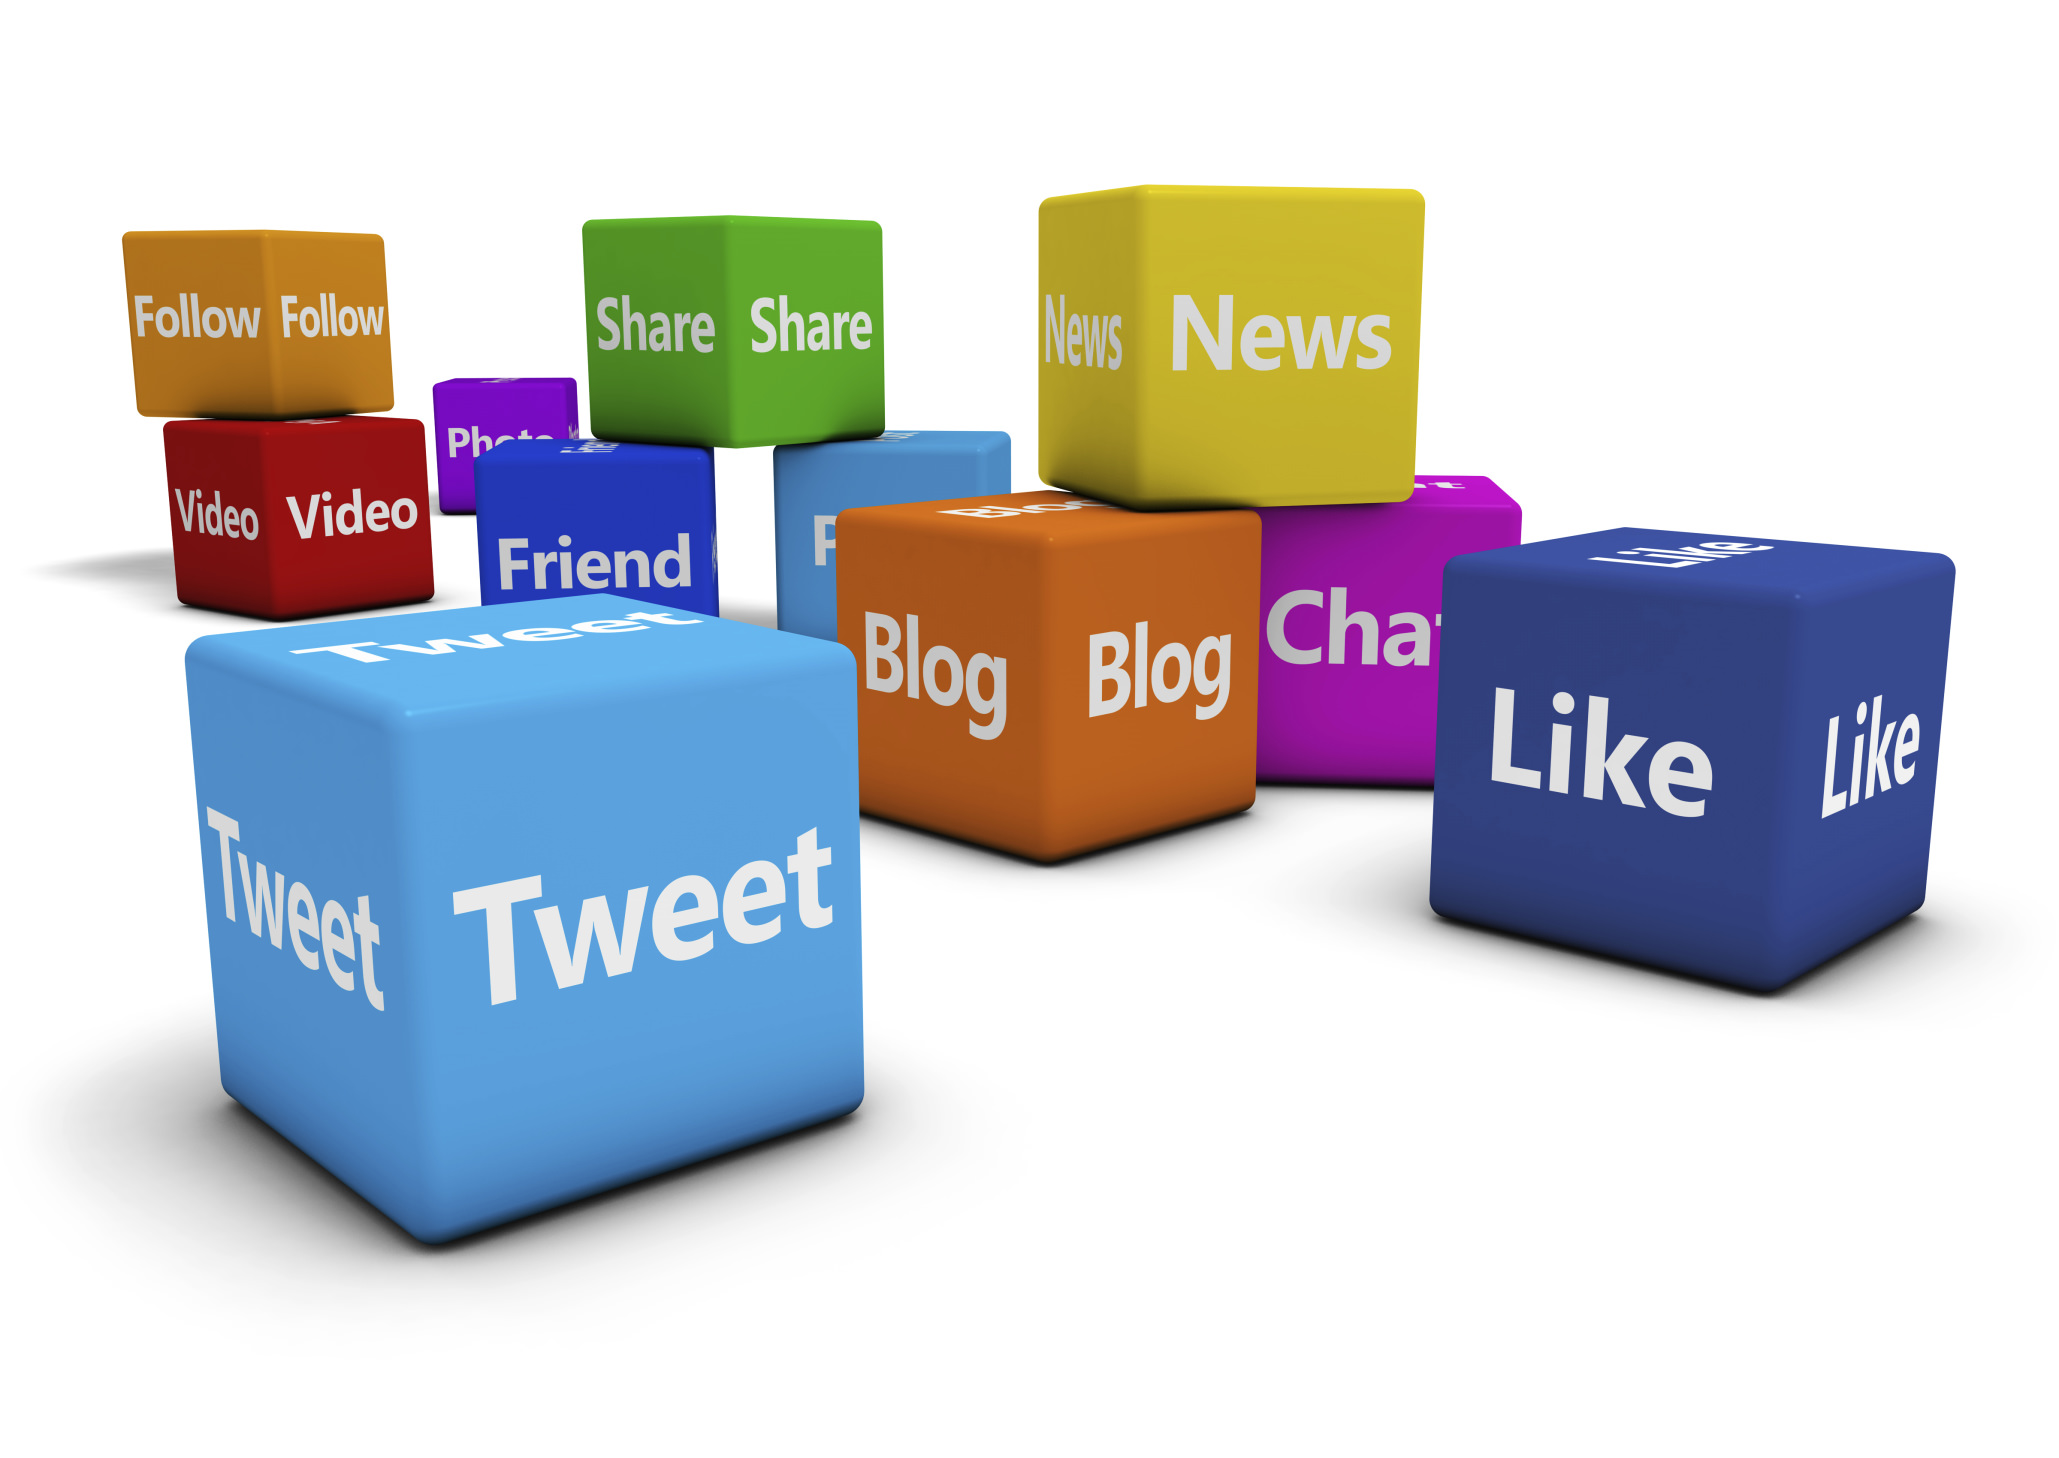 Social Media Web Signs On Cubes